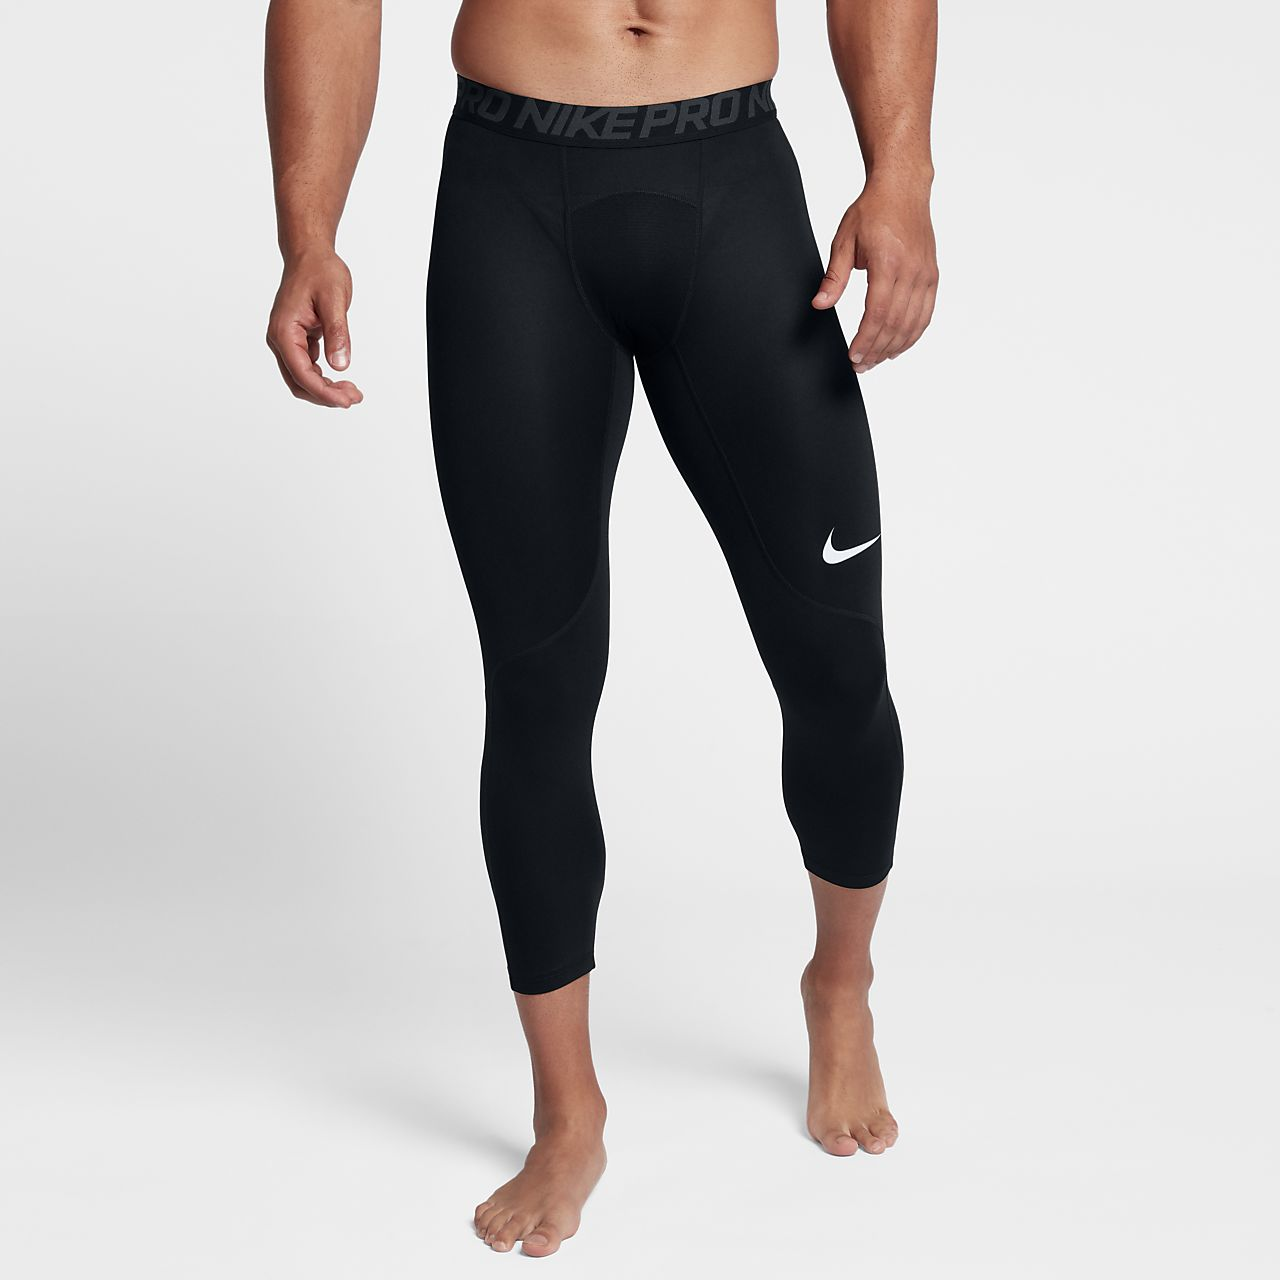 Nike Pro Malles d'entrenament de 3/4 - Home